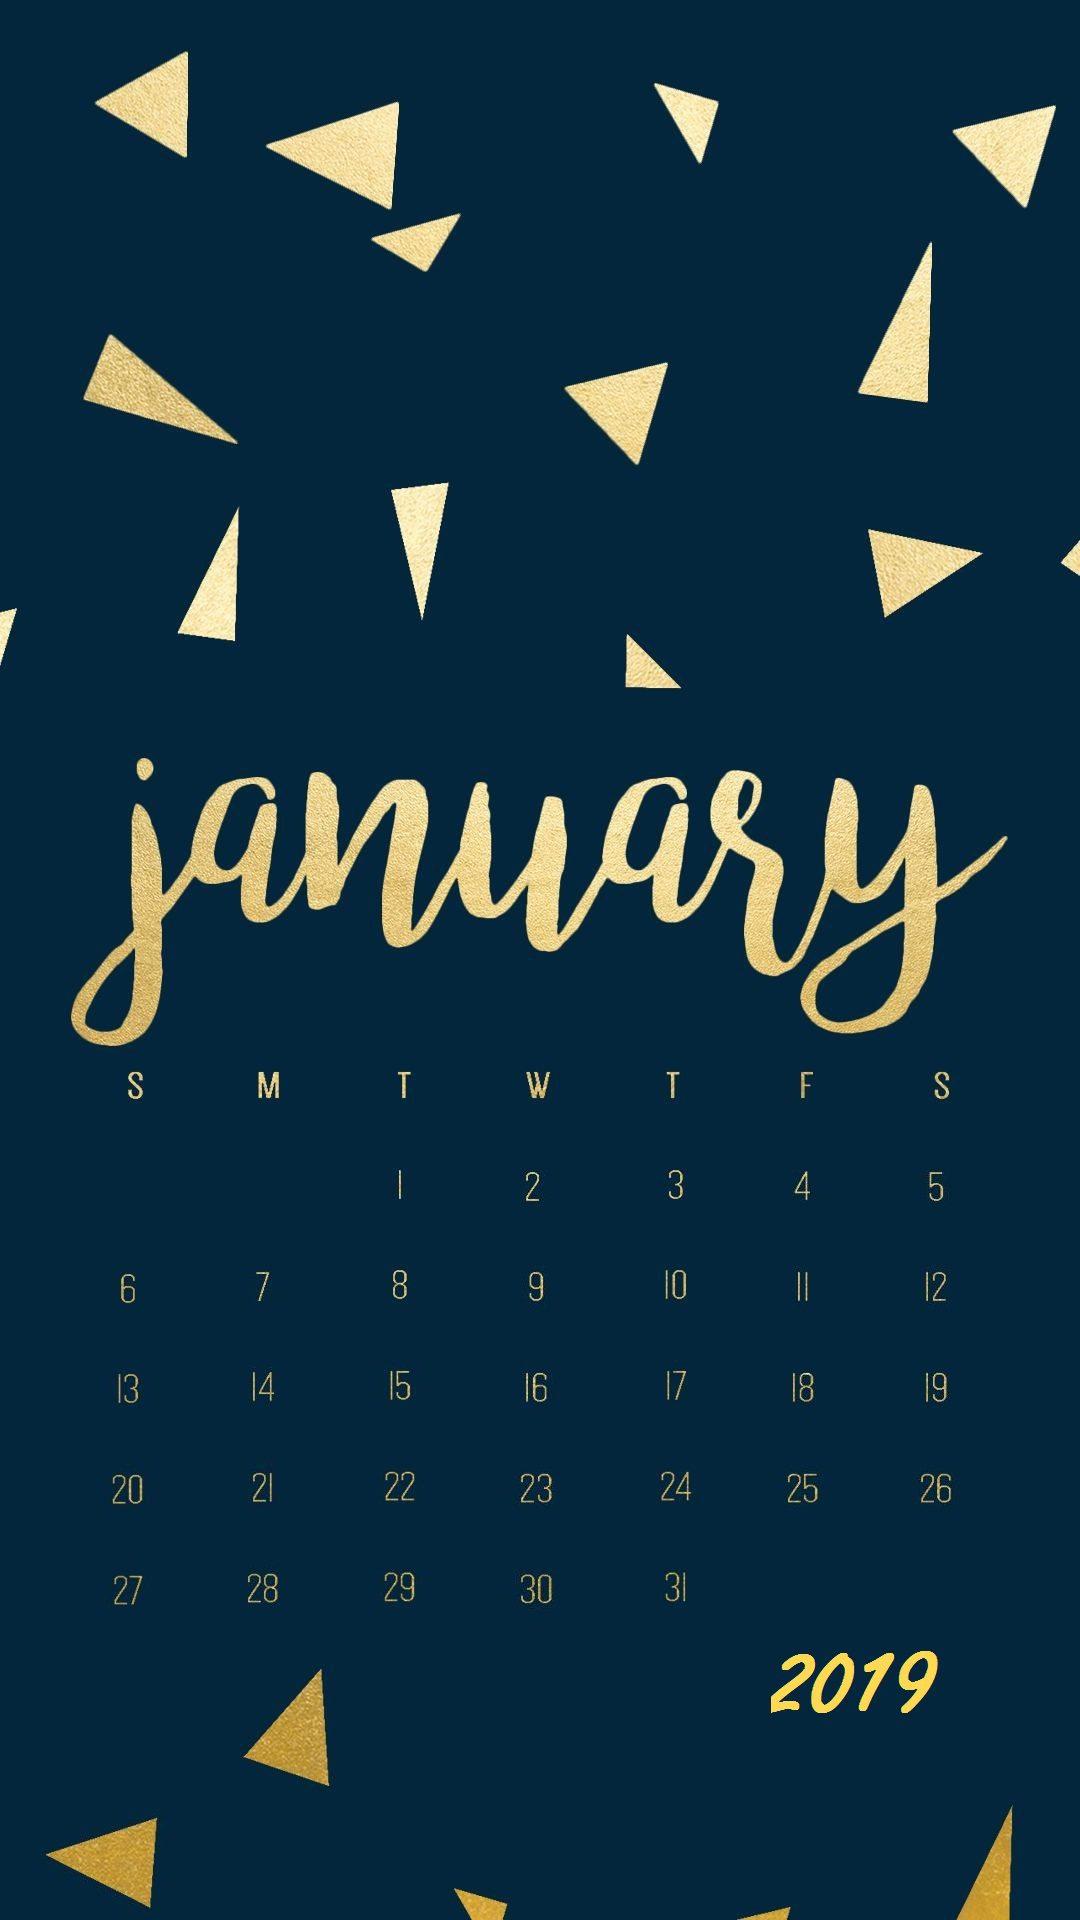 Golden Stones January 2019 iPhone Calendar